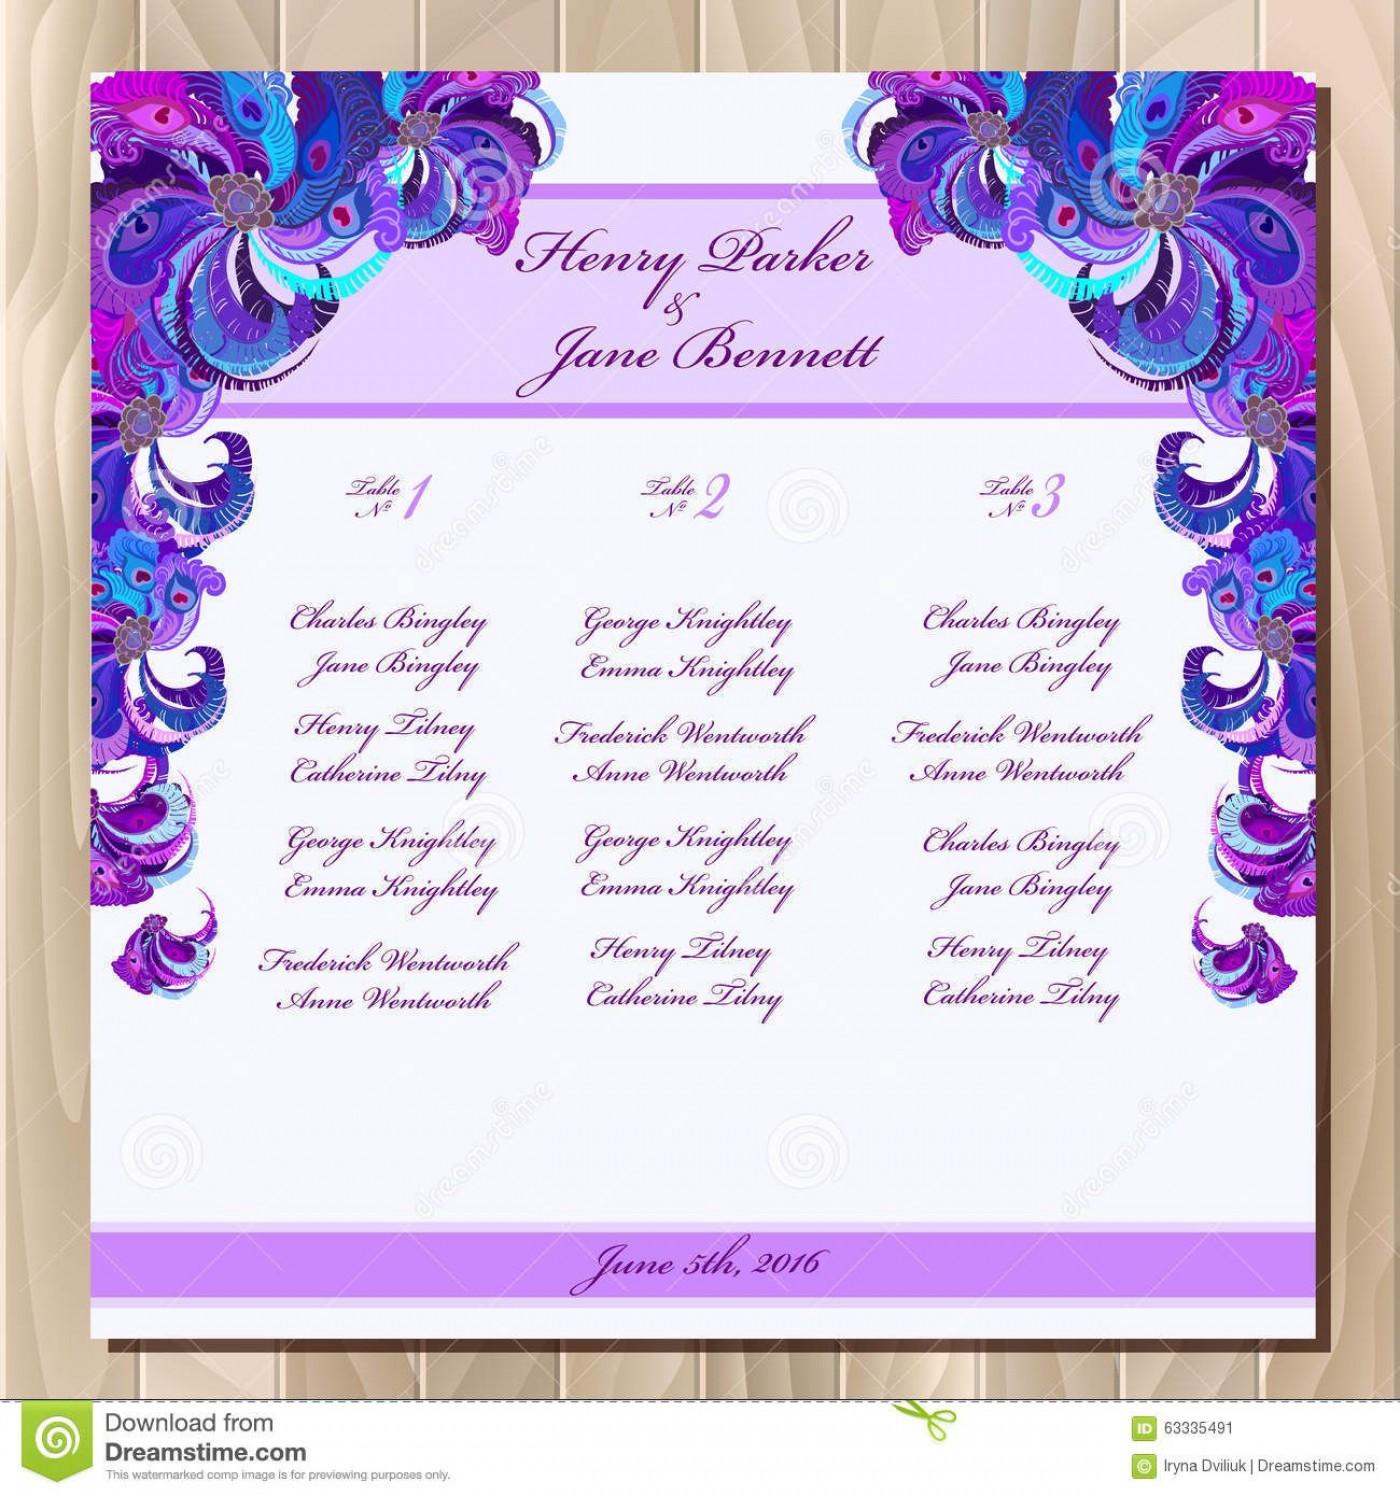 003 Surprising Wedding Guest List Excel Spreadsheet Template Highest Clarity 1400